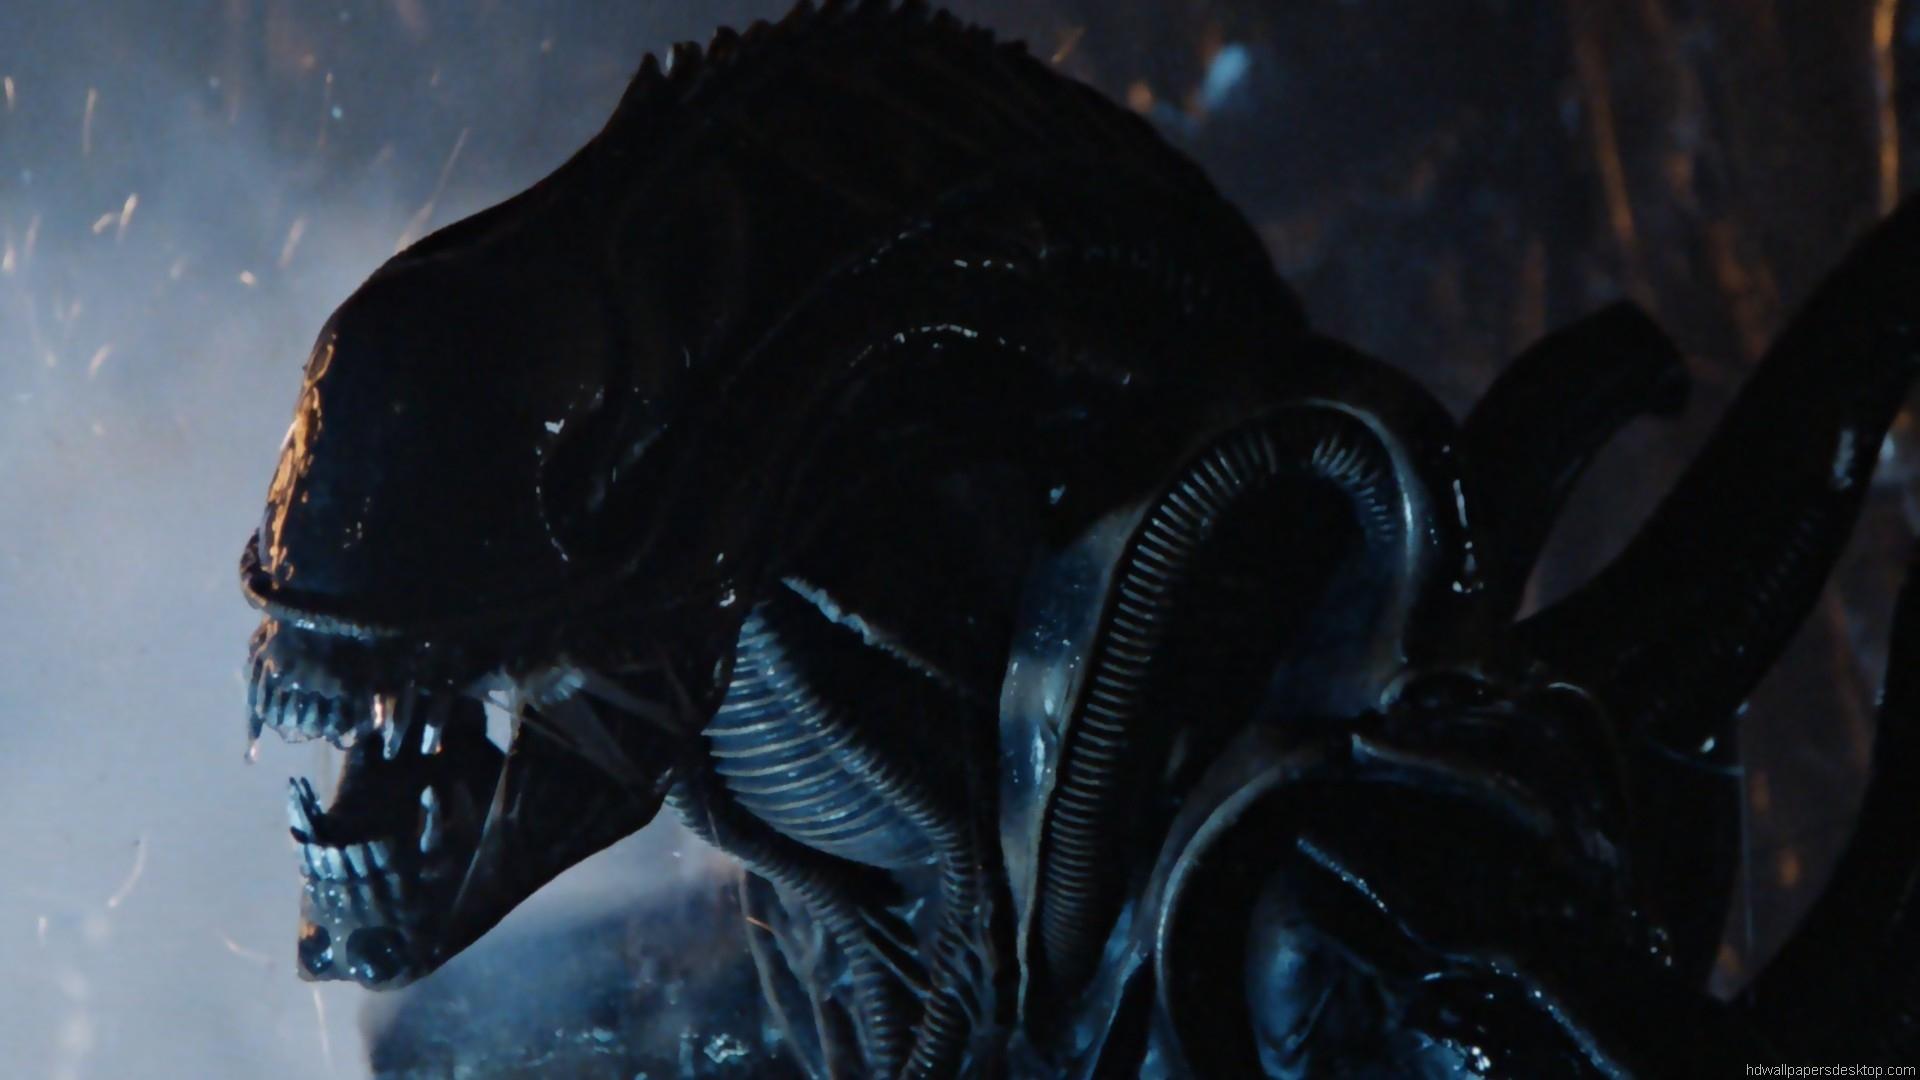 Aliens 1986 Wallpaper HD Movie Wallpaper 1920x1080 1920x1080